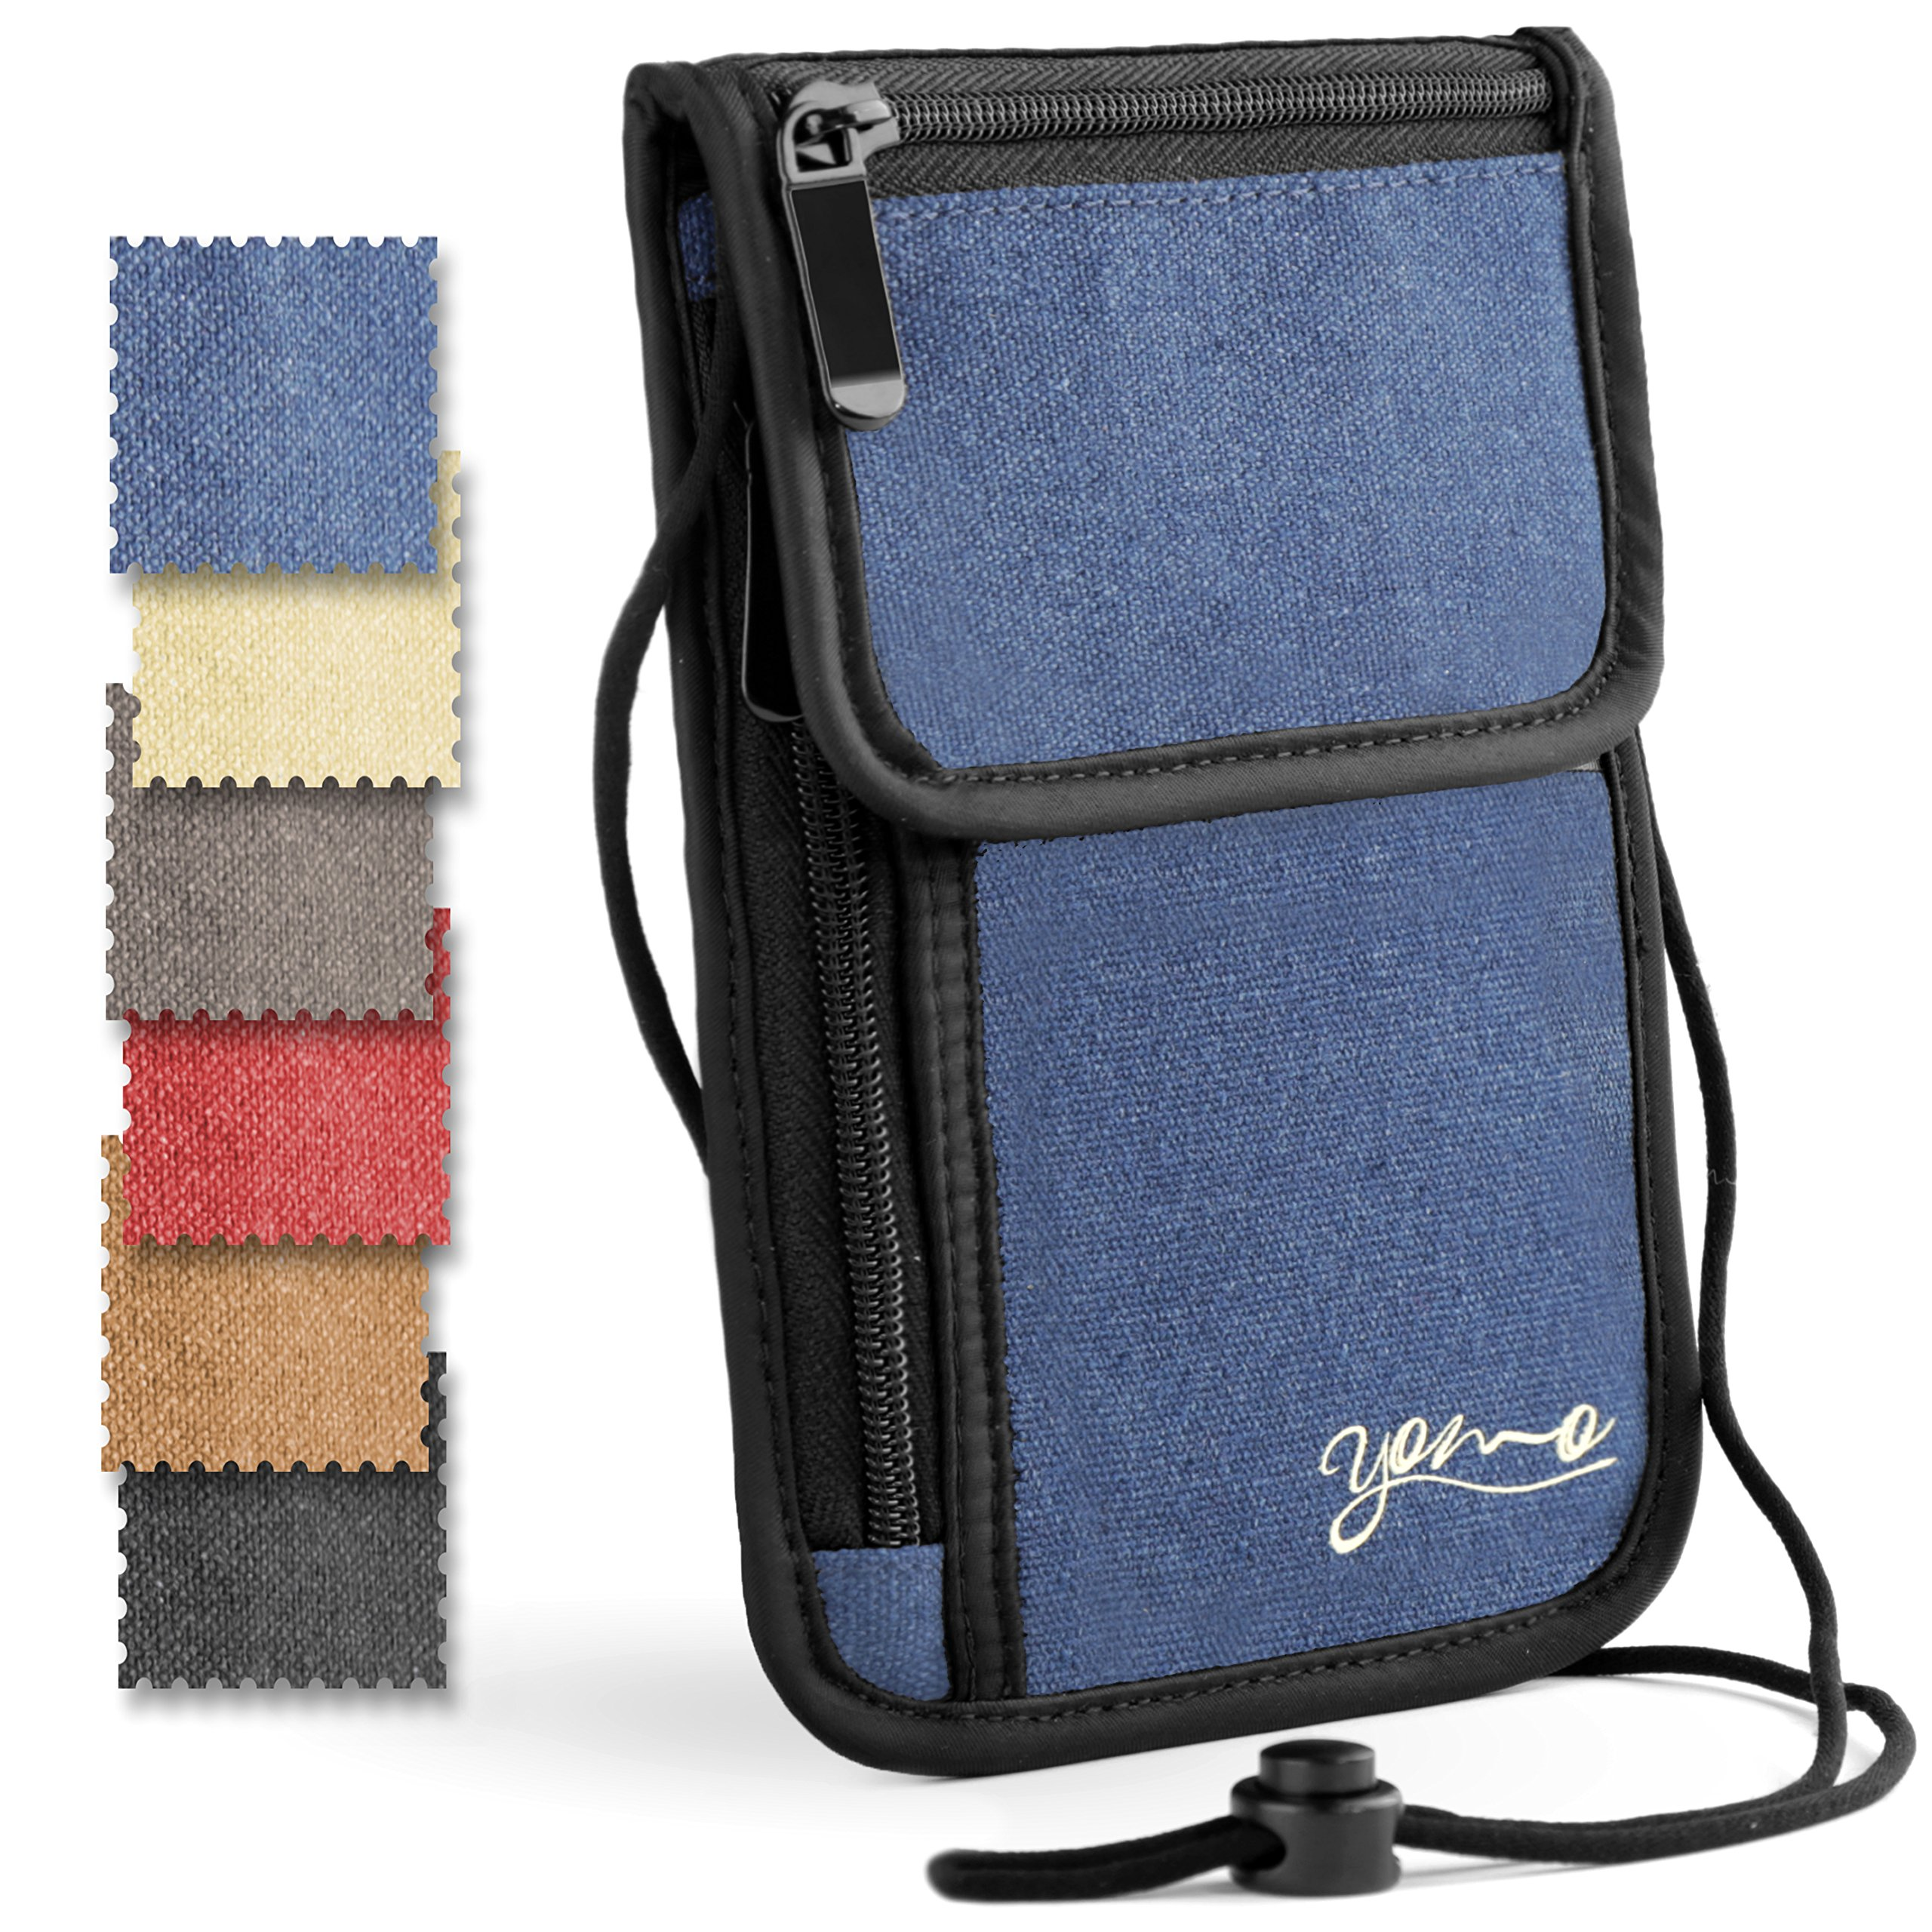 YOMO Designer Passport Holder. Top Rated. Water-resistant ... Designer Passport Holder